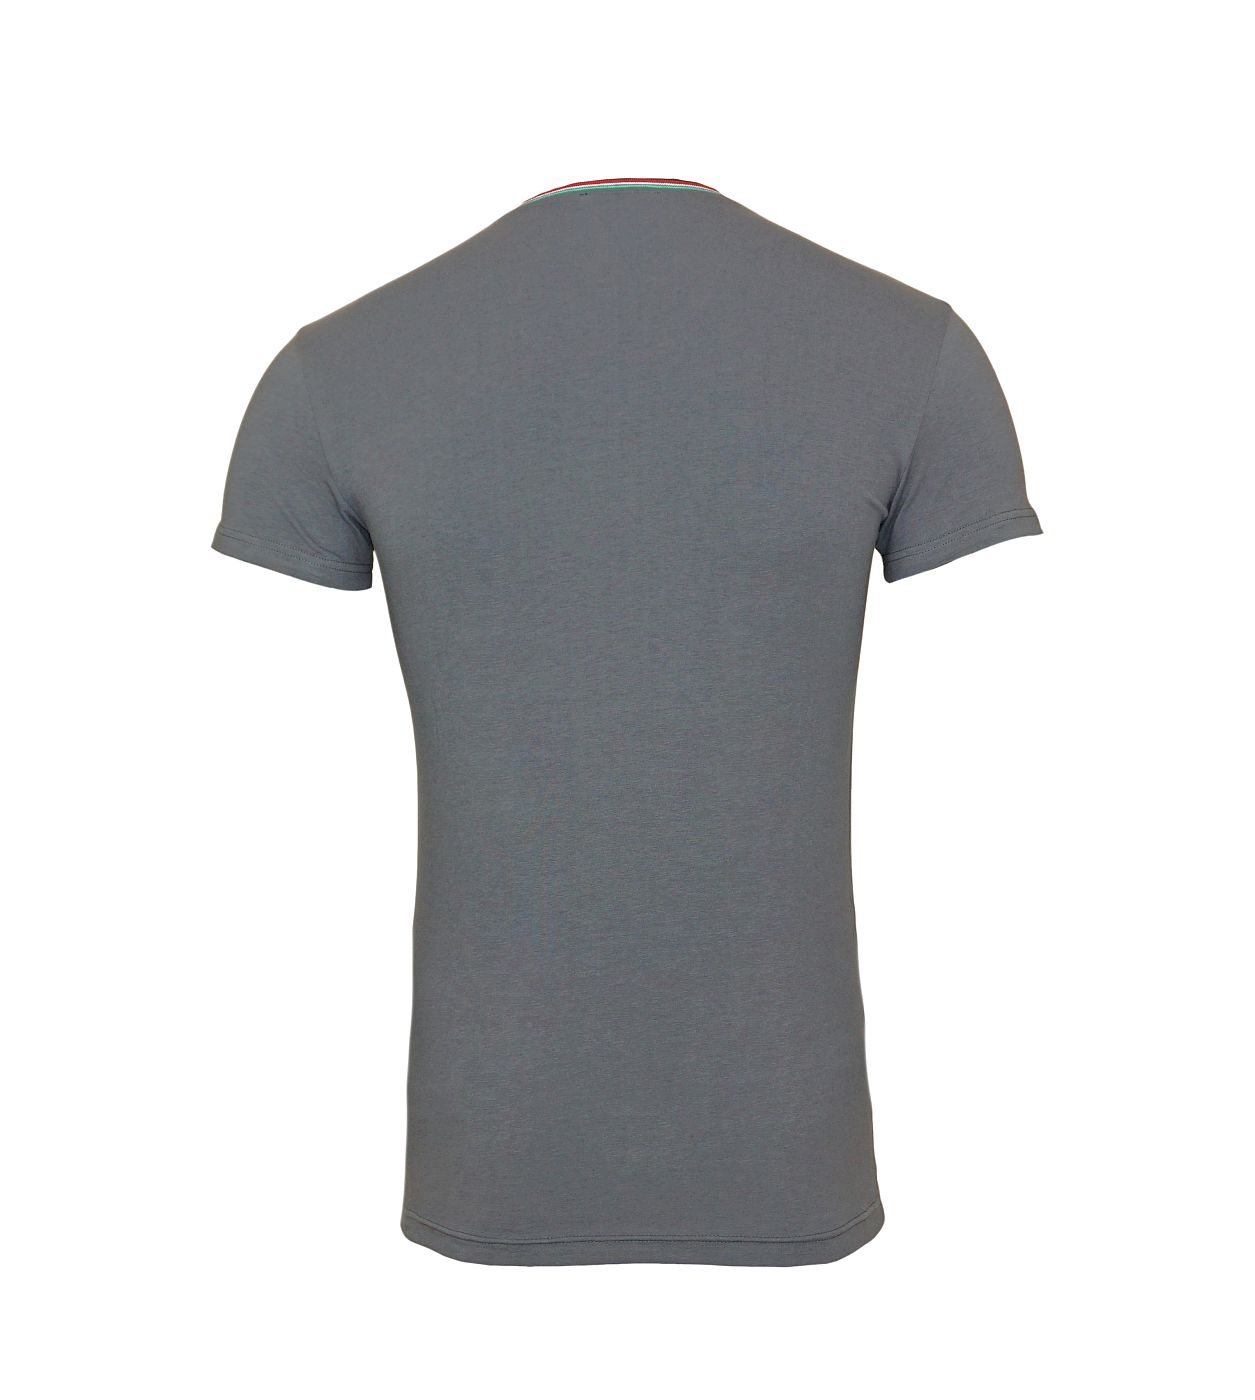 Emporio Armani T-Shirts V-Ausschnitt 110810 8A510 00044 ANTRACITE SH18-EAT2